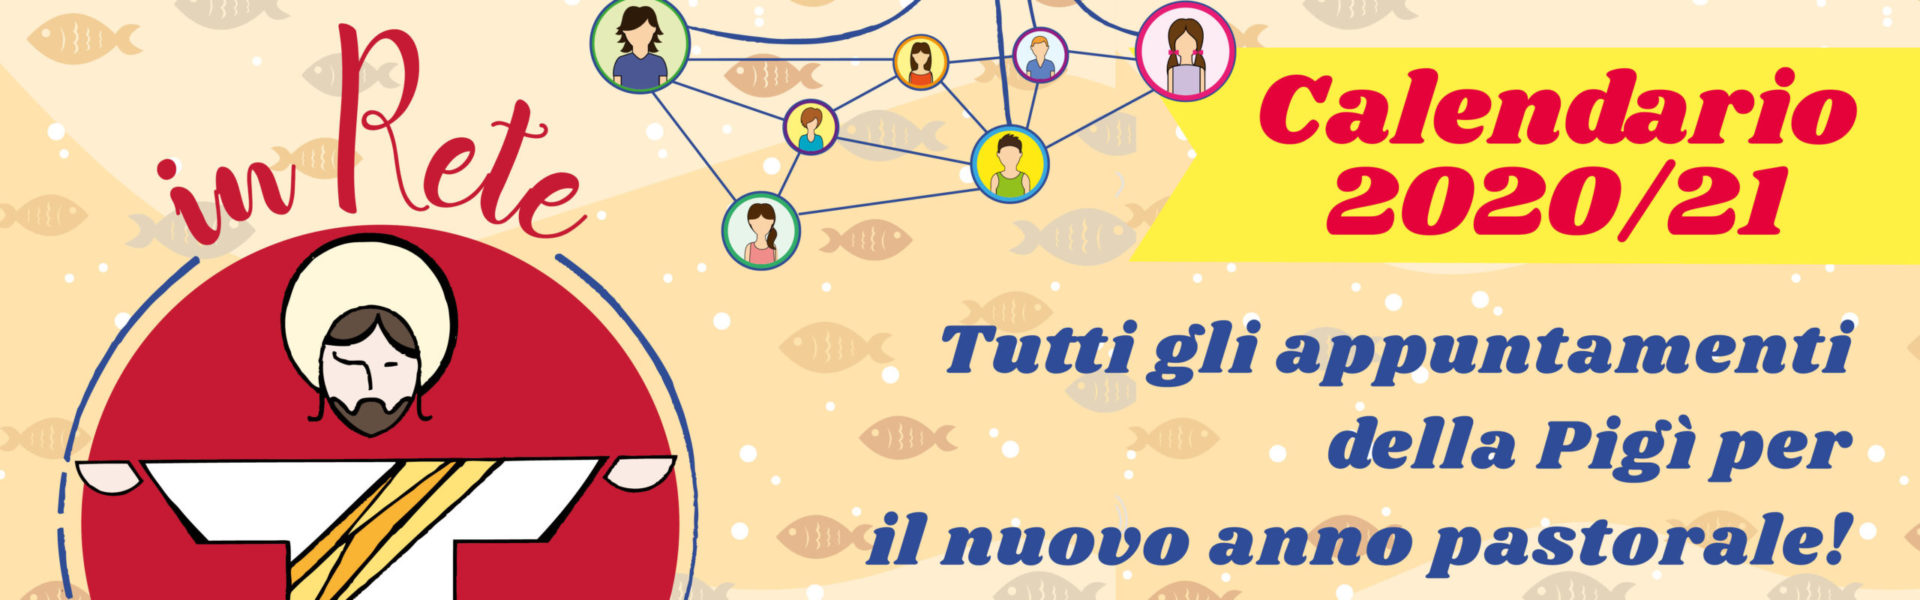 Calendario appuntamenti PiGì 2020-2021 - BANNER